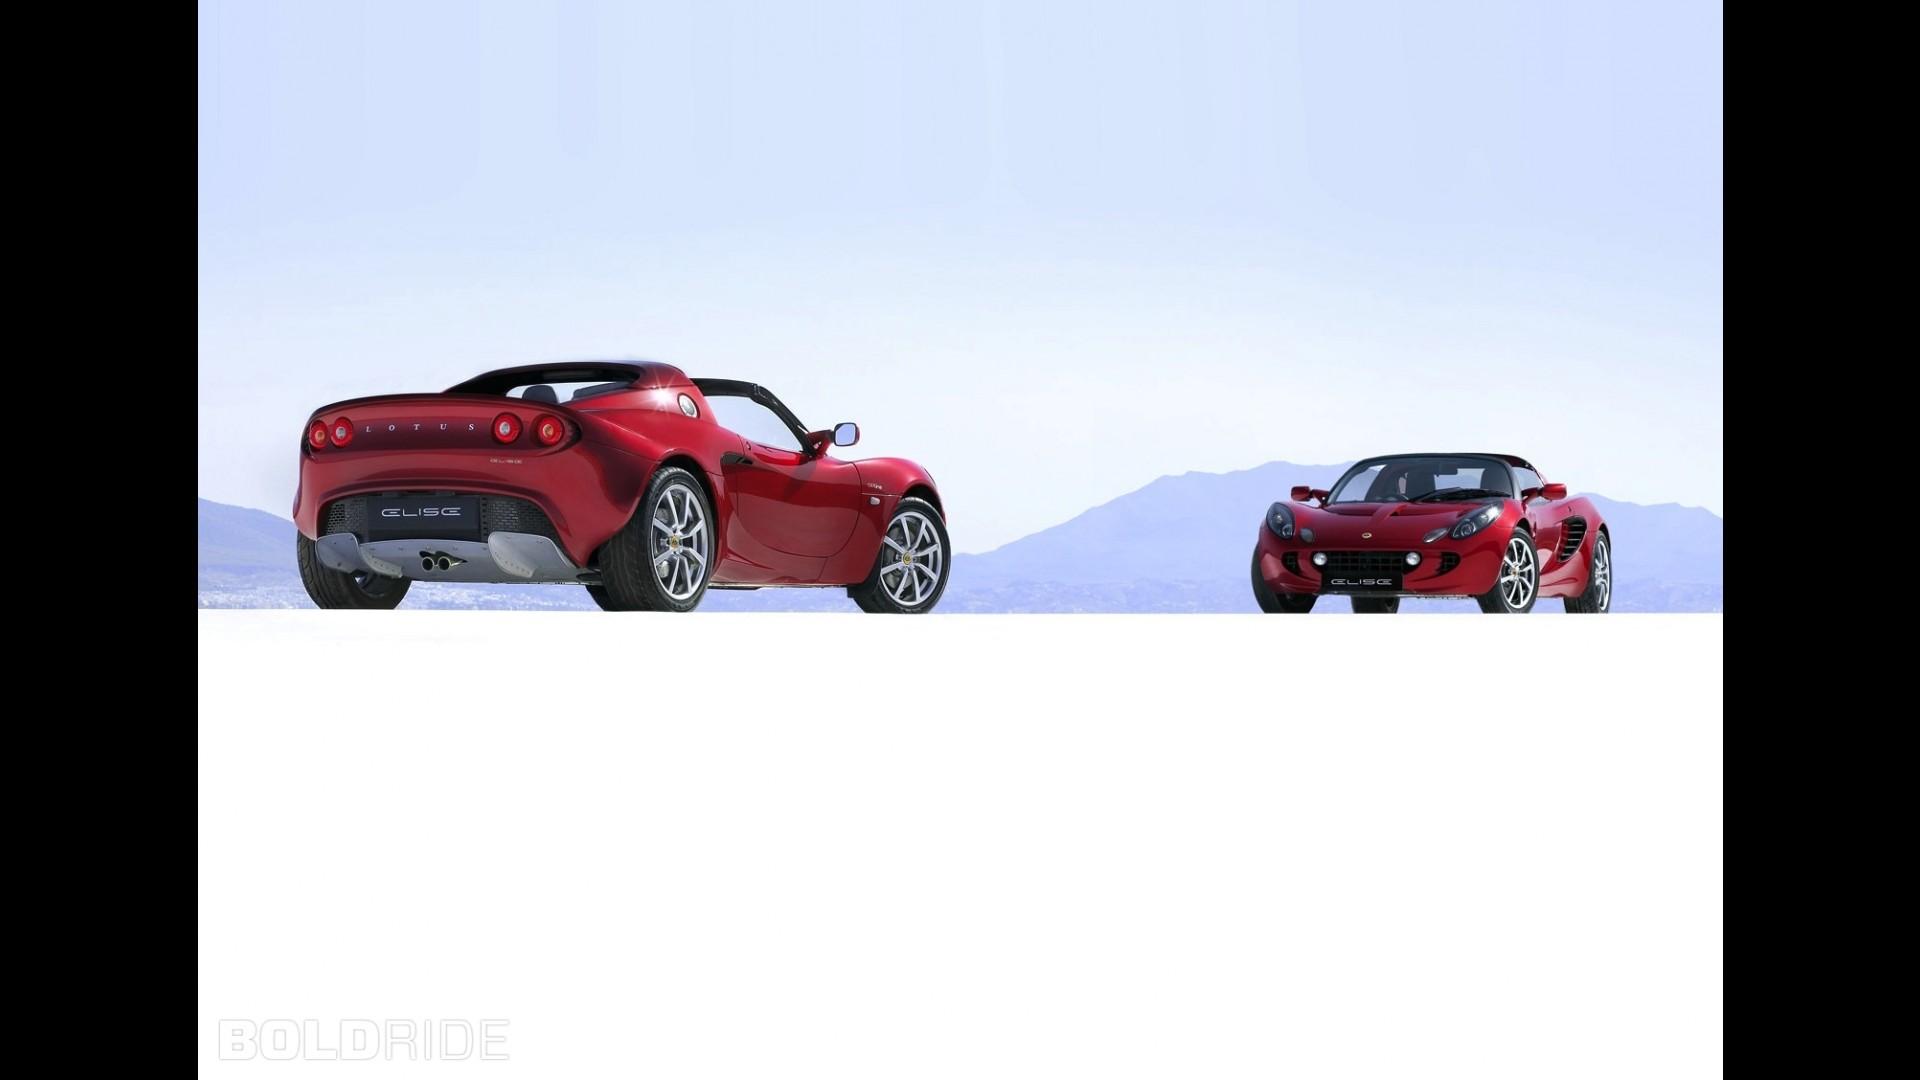 https://icdn-1.motor1.com/images/mgl/QOK1O/s1/lotus-elise-r.jpg